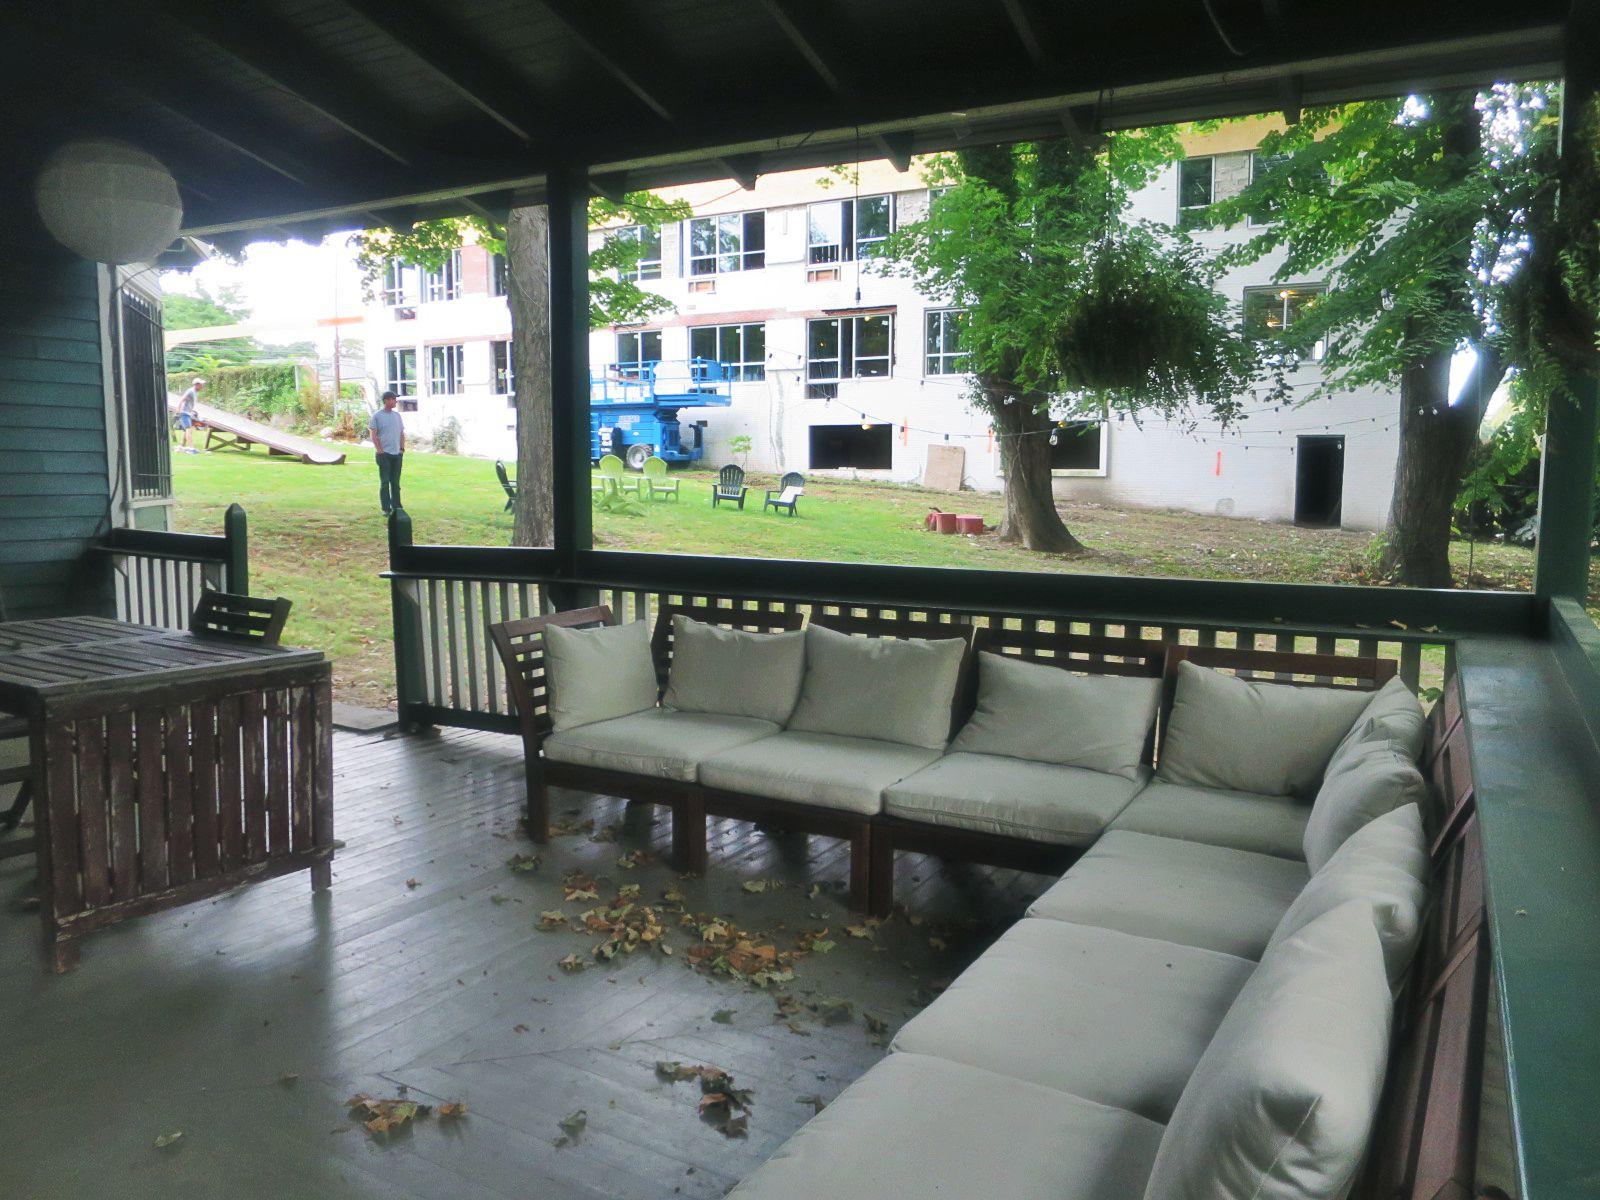 eastfallslocal-9-24-ringstetten-porch-side-background